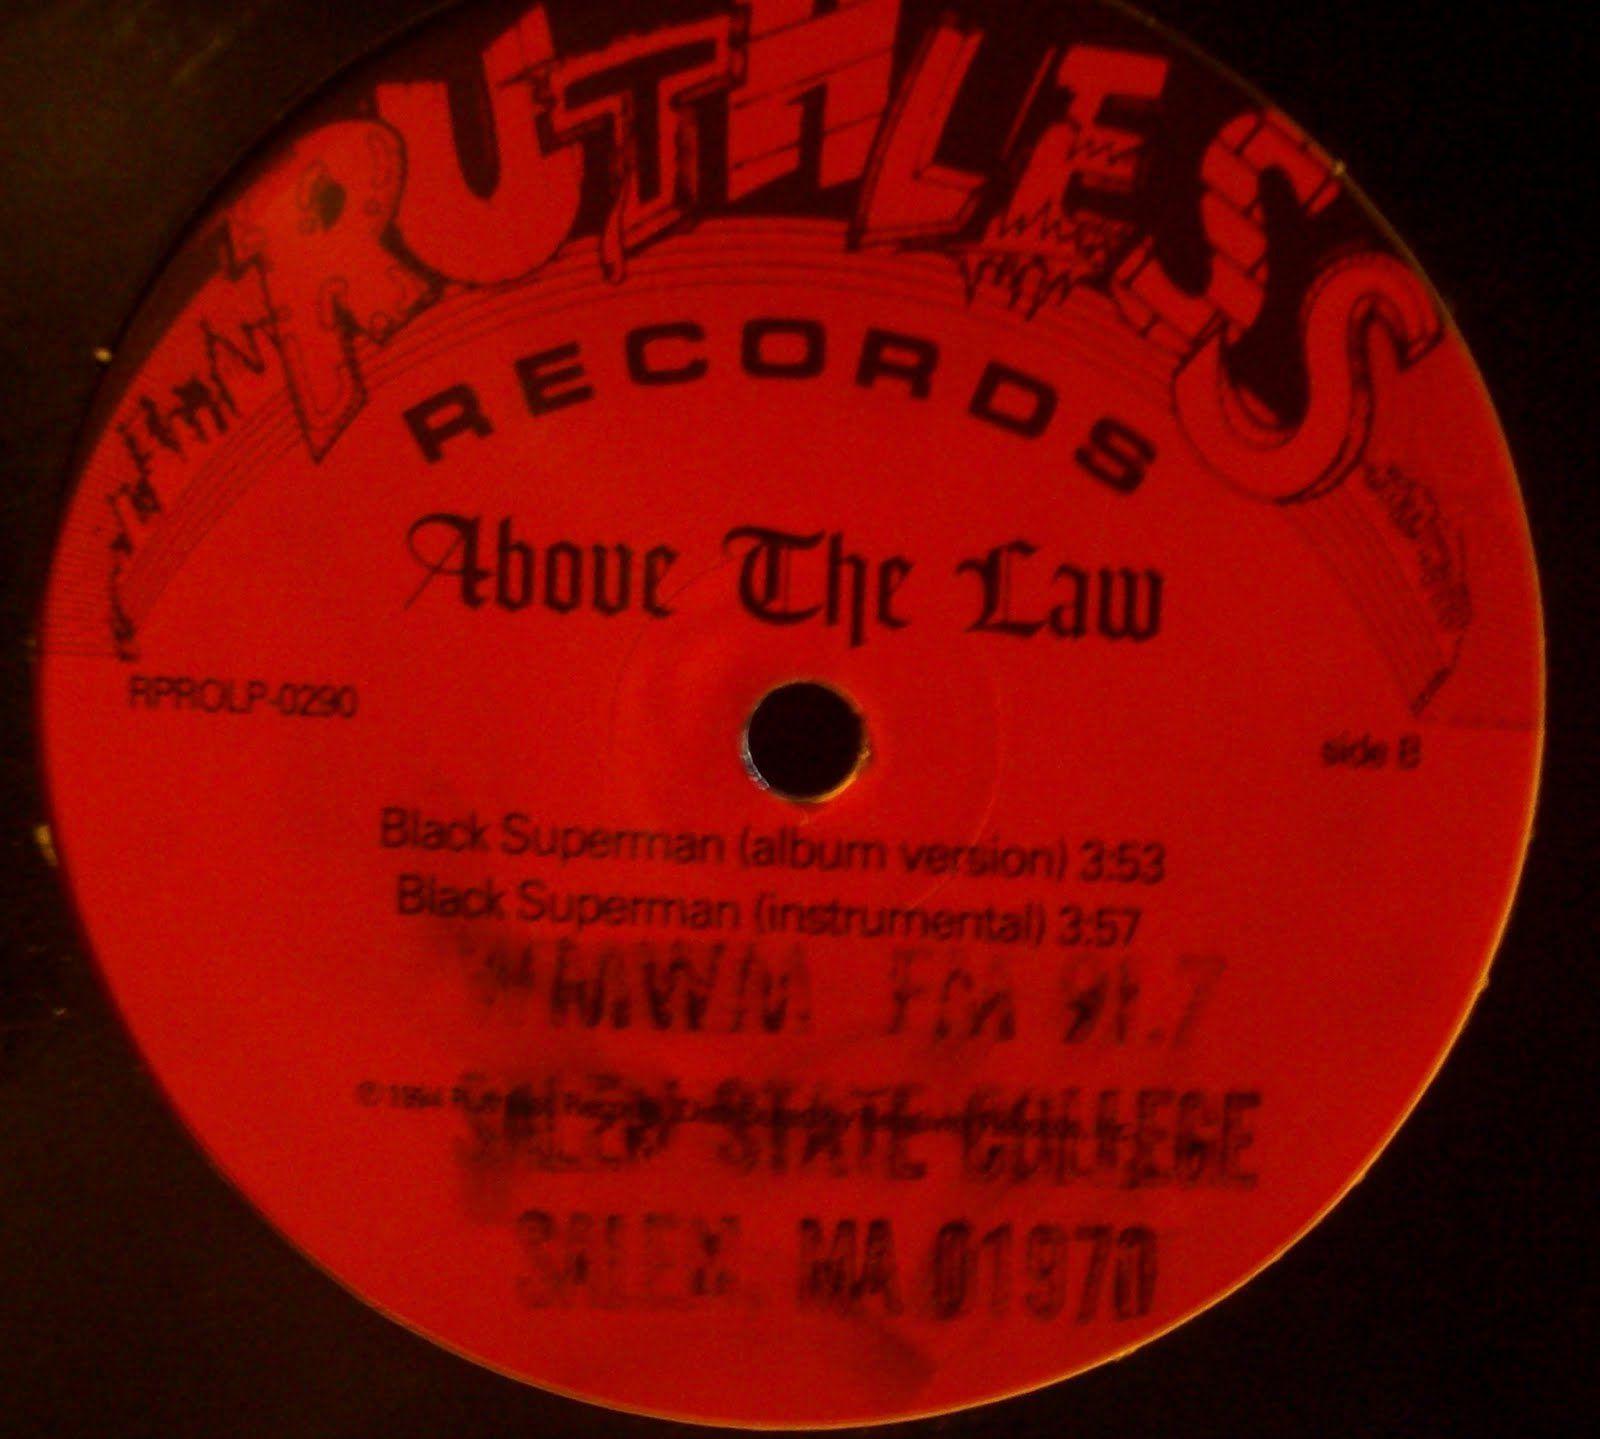 50 Best Rap/Hip-Hop Songs of the 90s